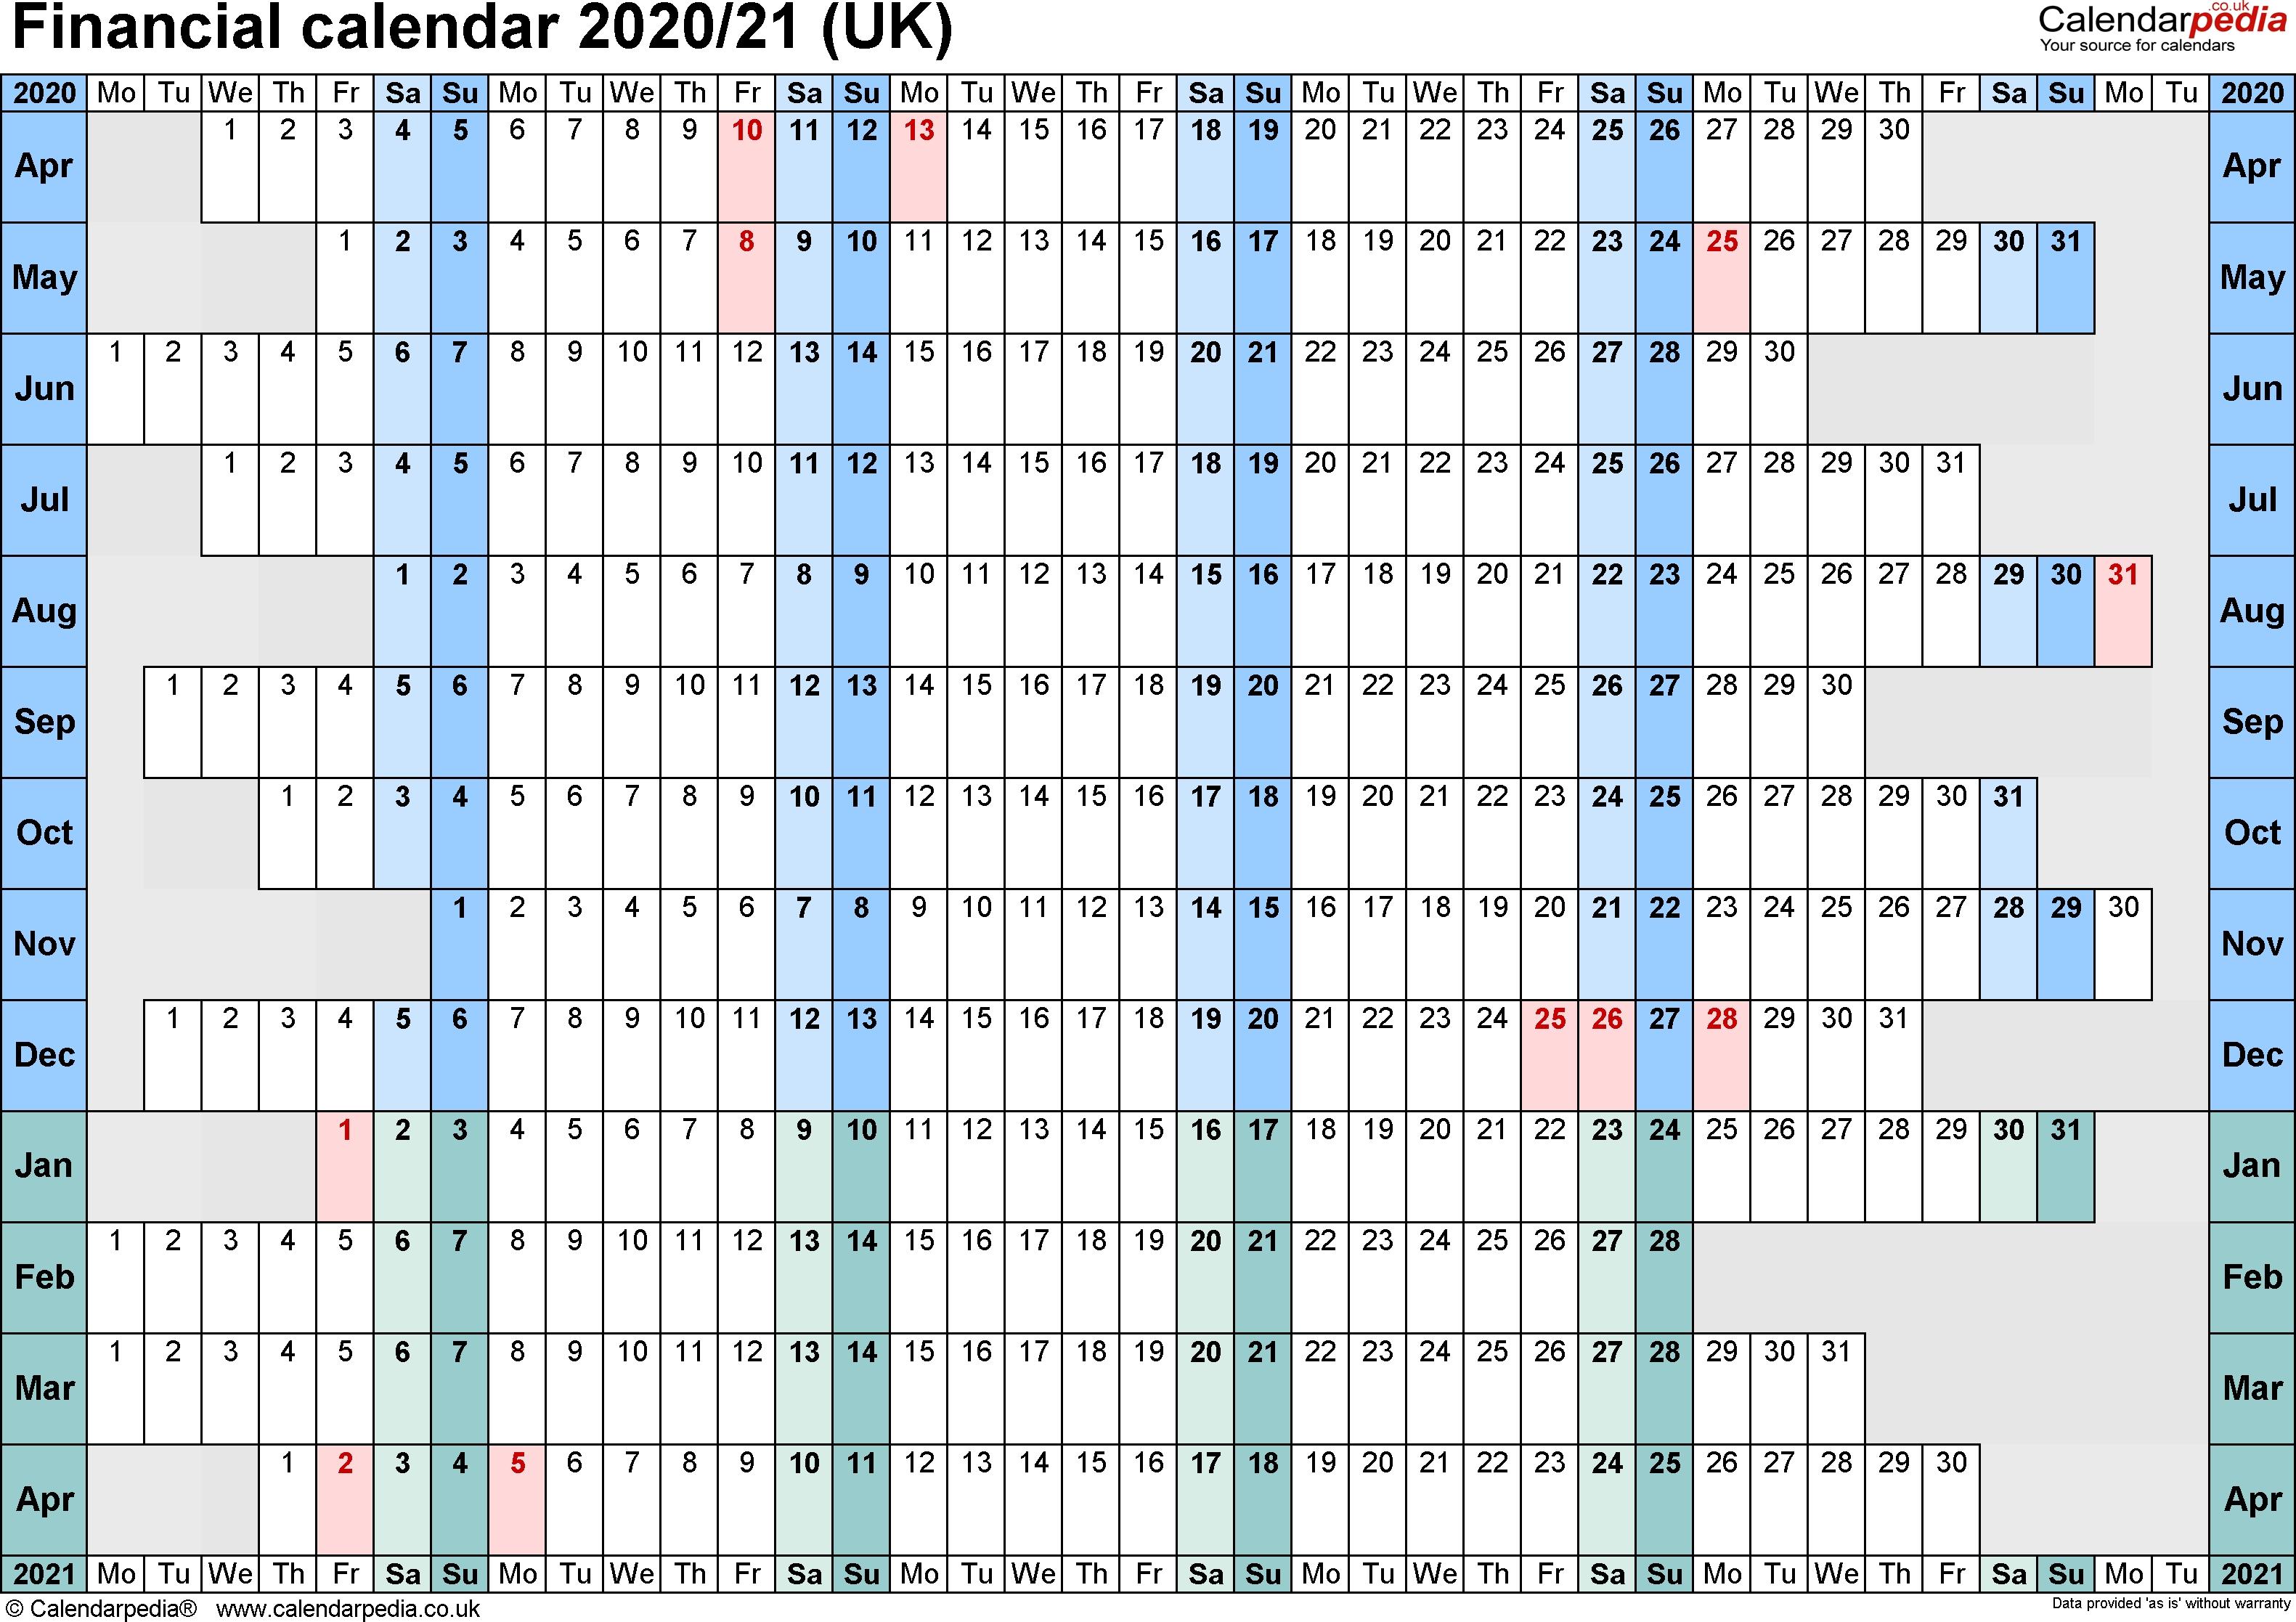 Financial Calendars 2020/21 (Uk) In Pdf Format regarding Hmrc Calendar 2019 2020